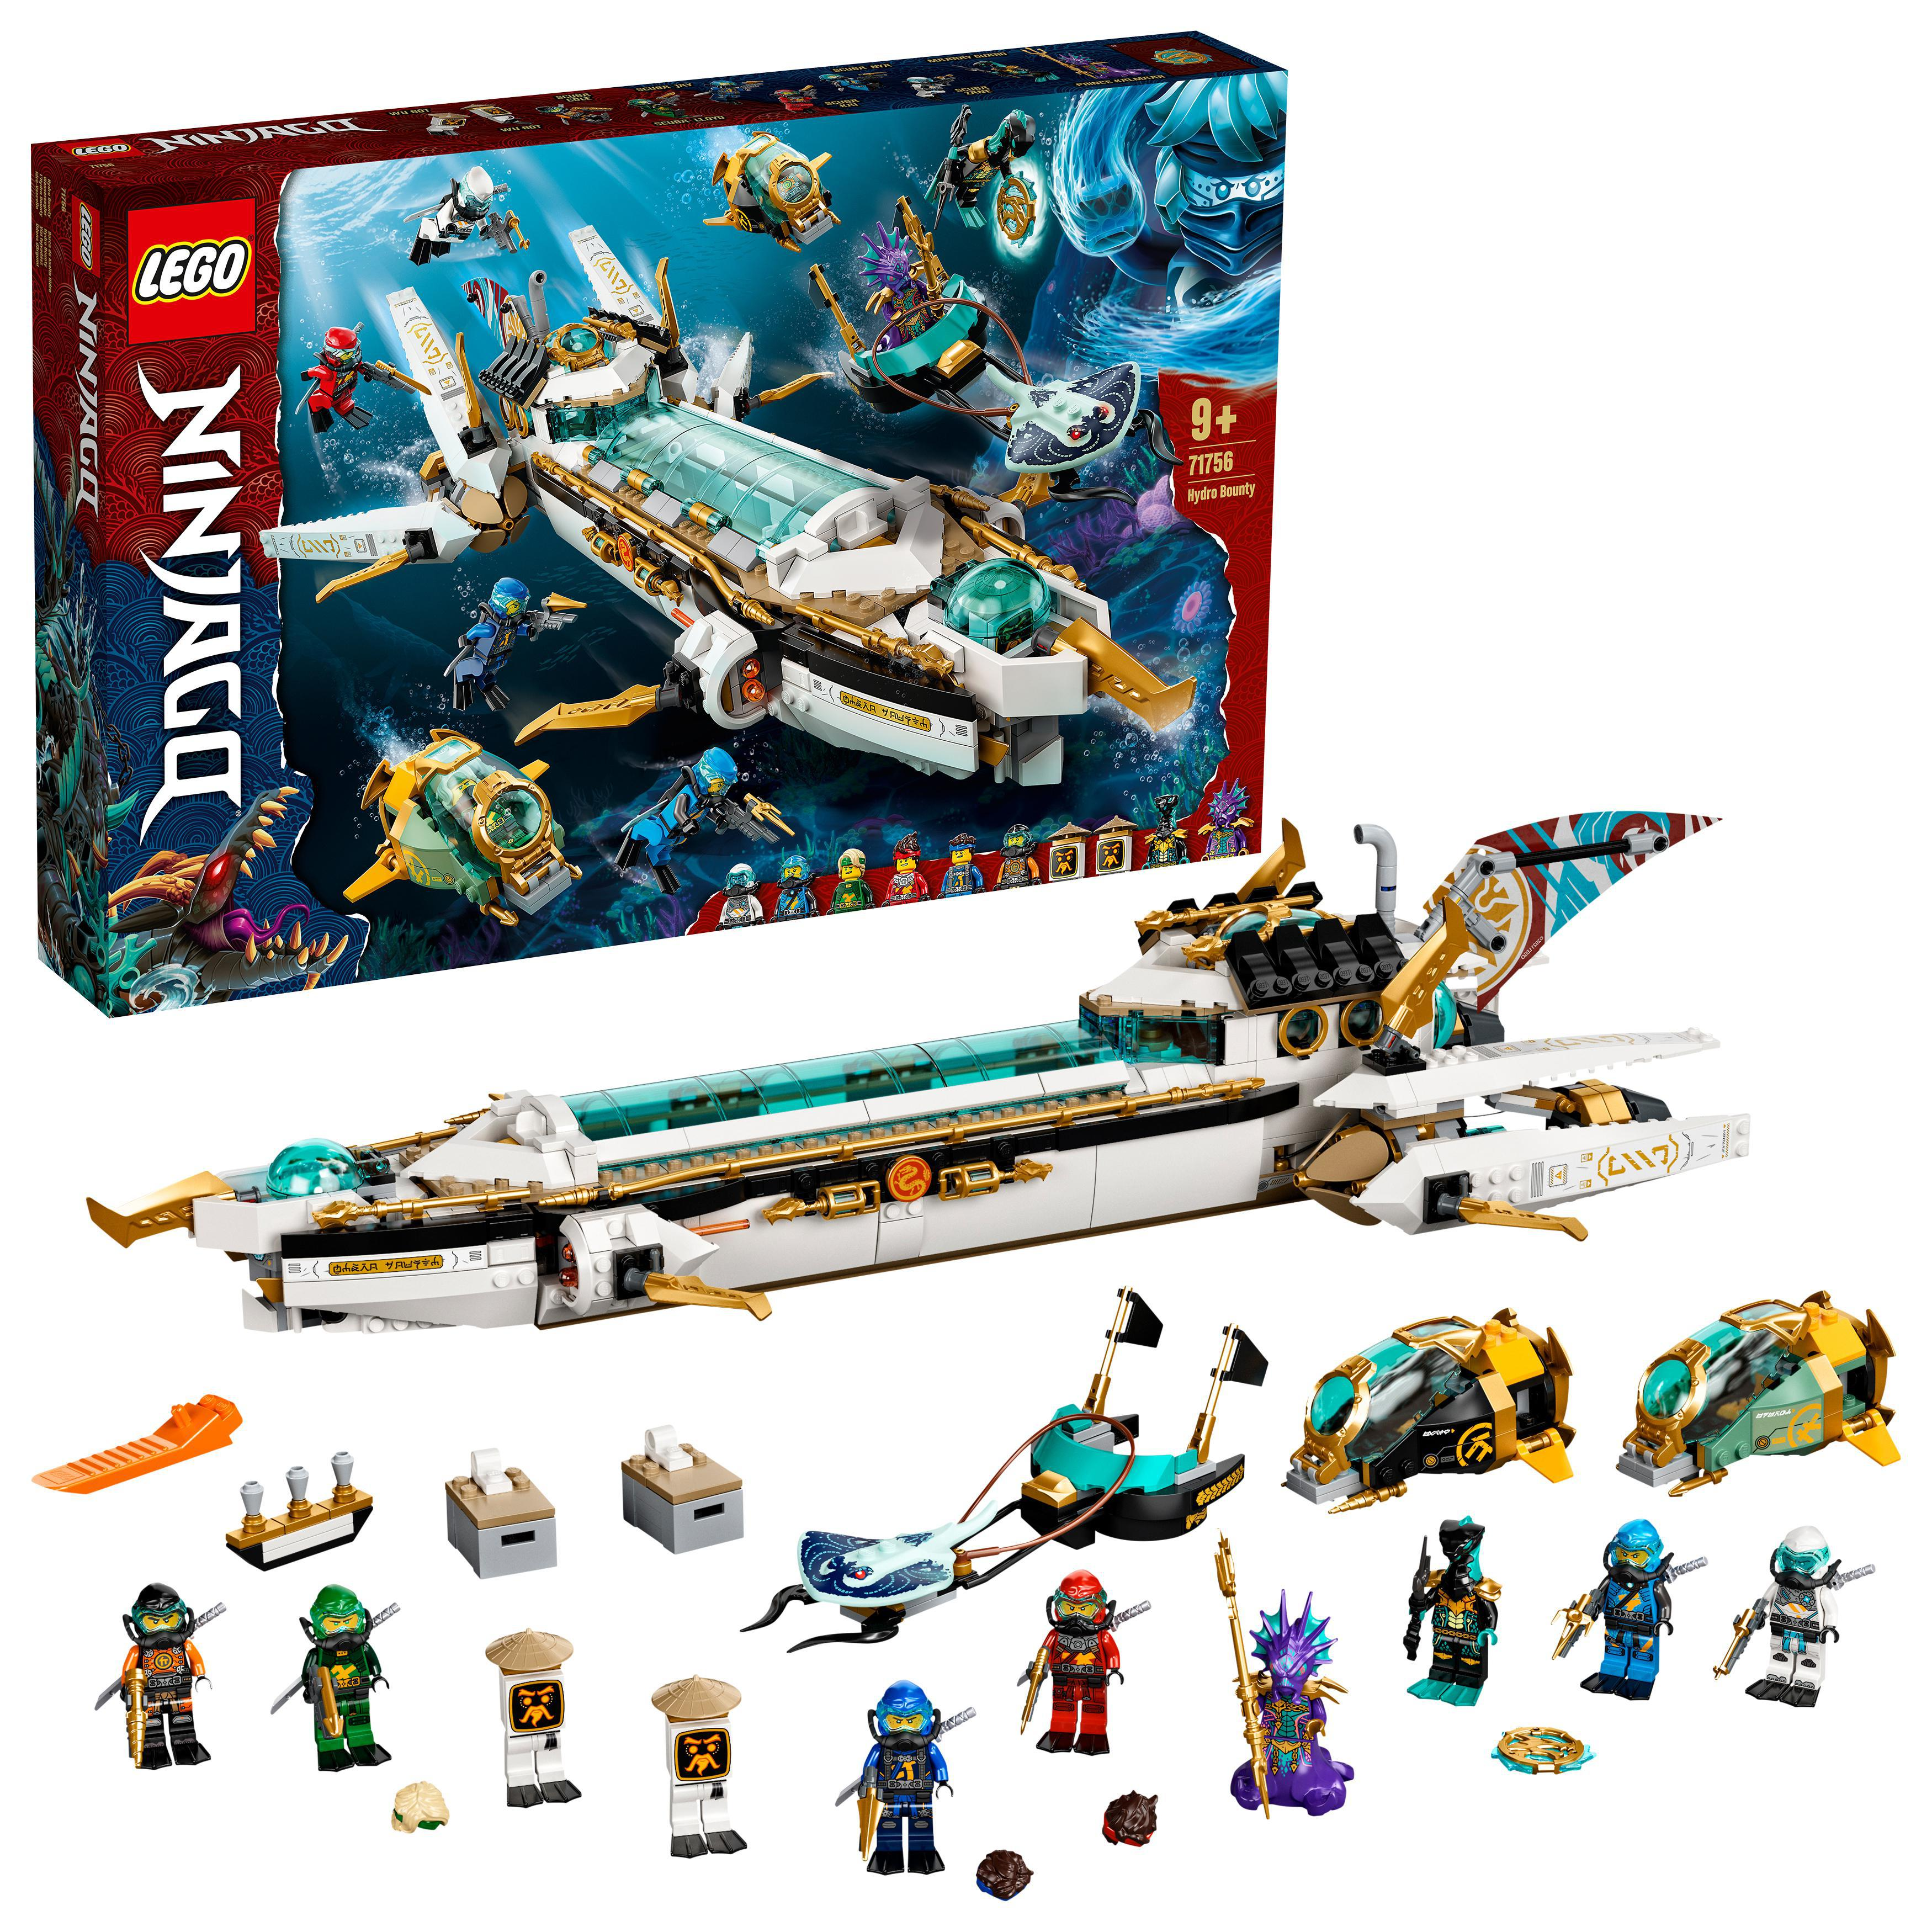 LEGO NINJAGO - Hydro Bounty (71756)